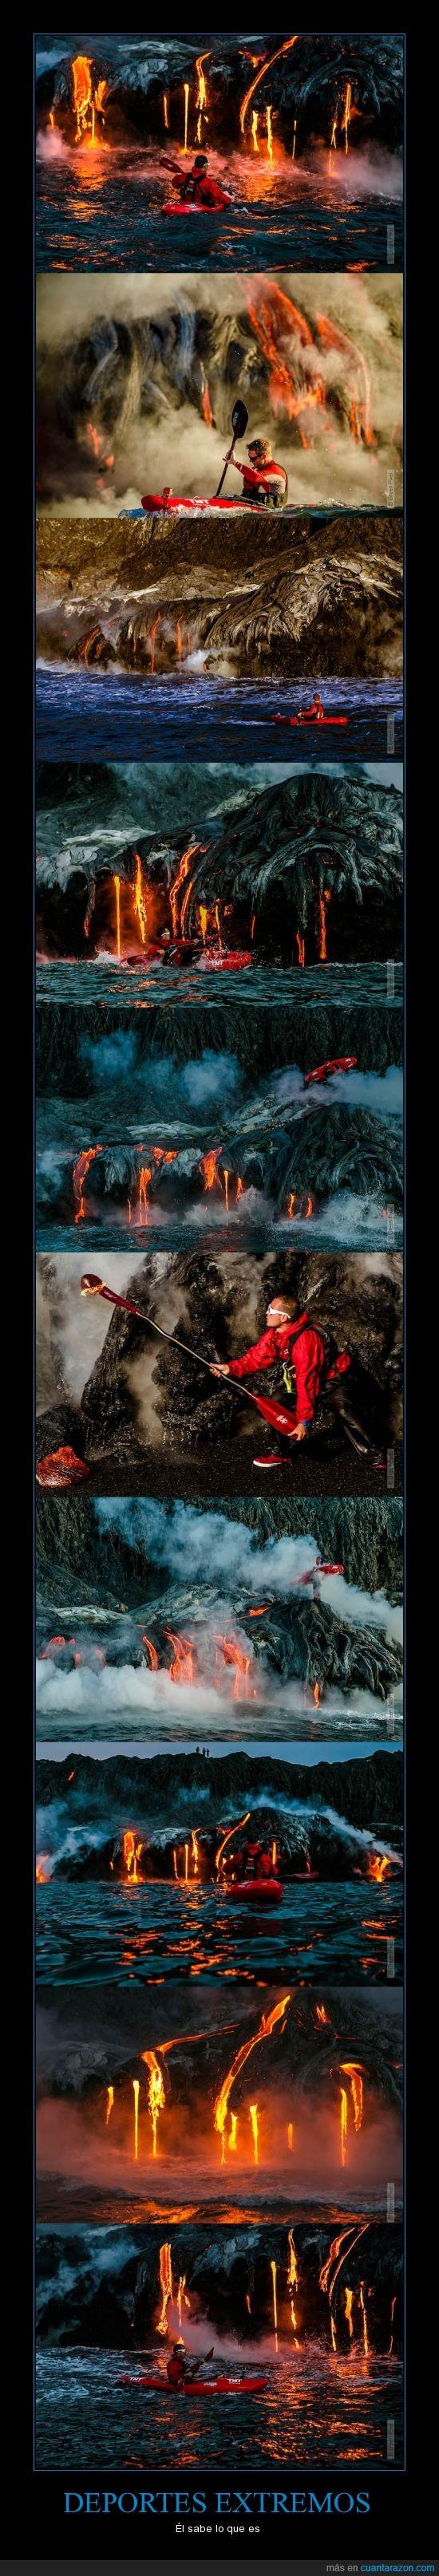 canoa,deporte,extremo,kayak,lava,rio,volcan